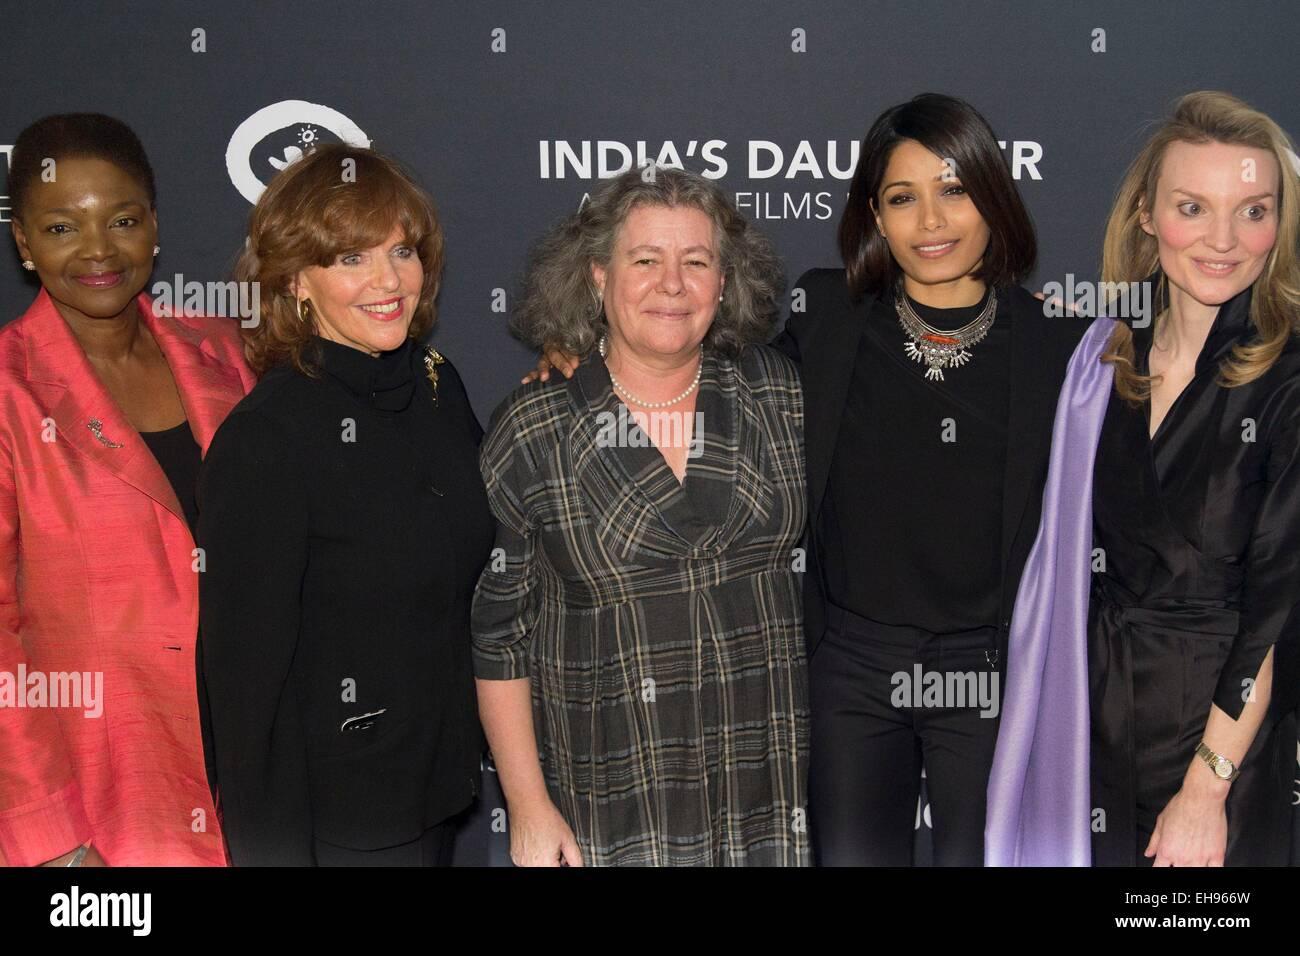 New York, NY, USA. 9th Mar, 2015. Baroness Amos, Susan Ann Davis, Tanya Barron, Freida Pinto, Alyse Nelson at arrivals - Stock Image